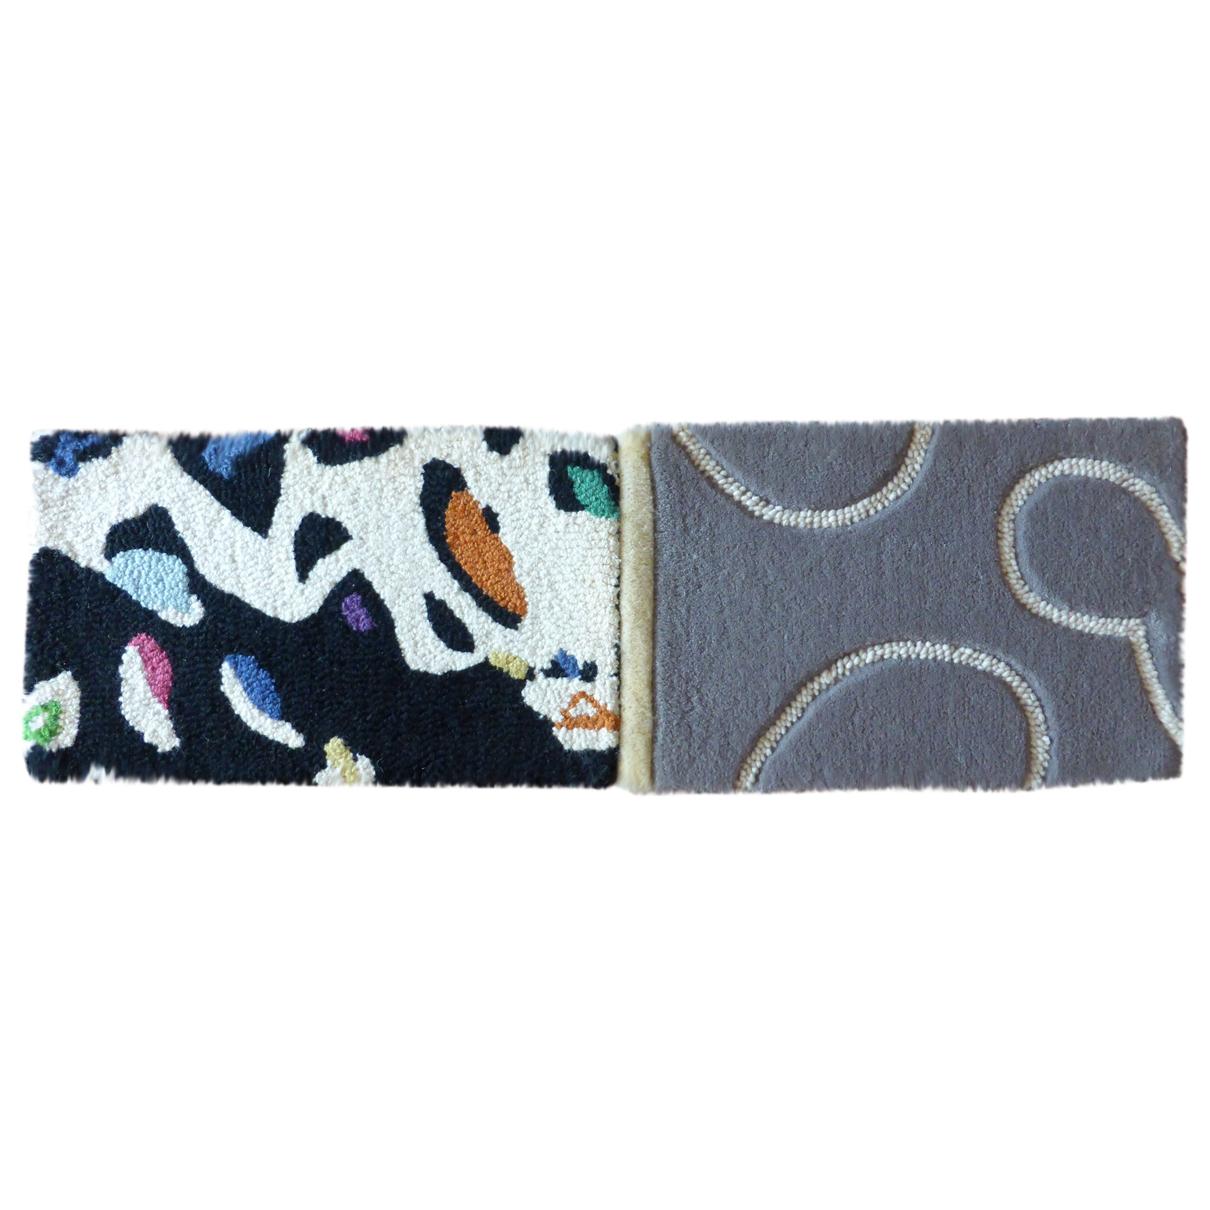 Missoni N Multicolour Wool Textiles for Life & Living N